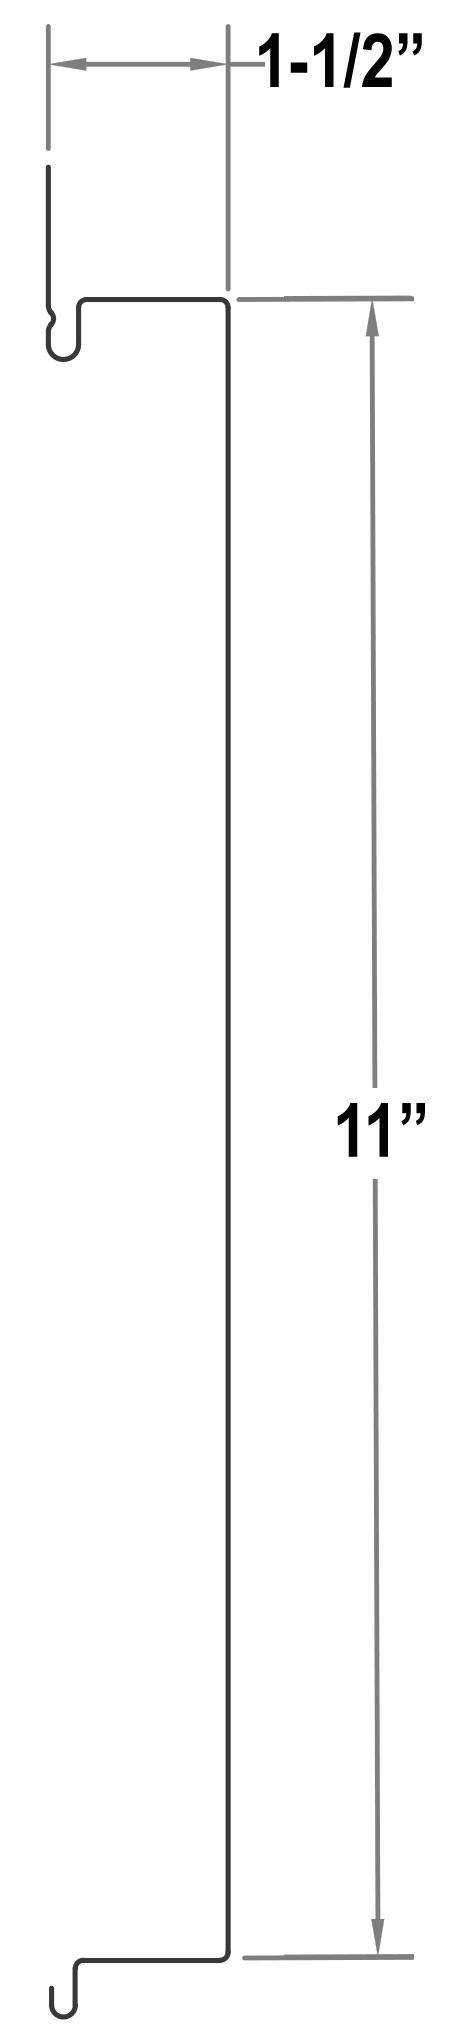 FP1511